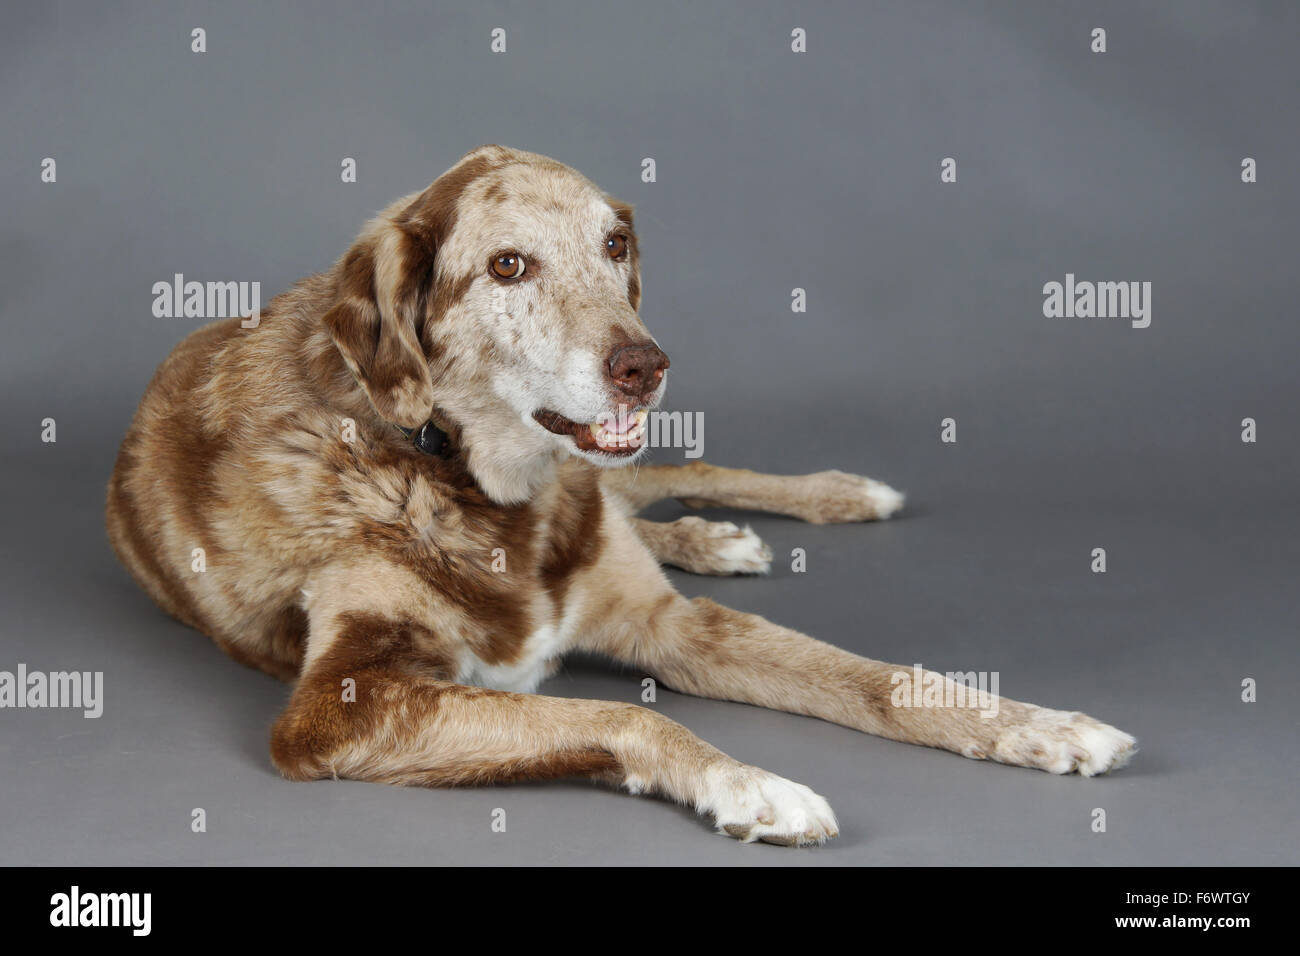 Beautiful big mixed labrador and Australian shepherd dog in studio - Stock Image